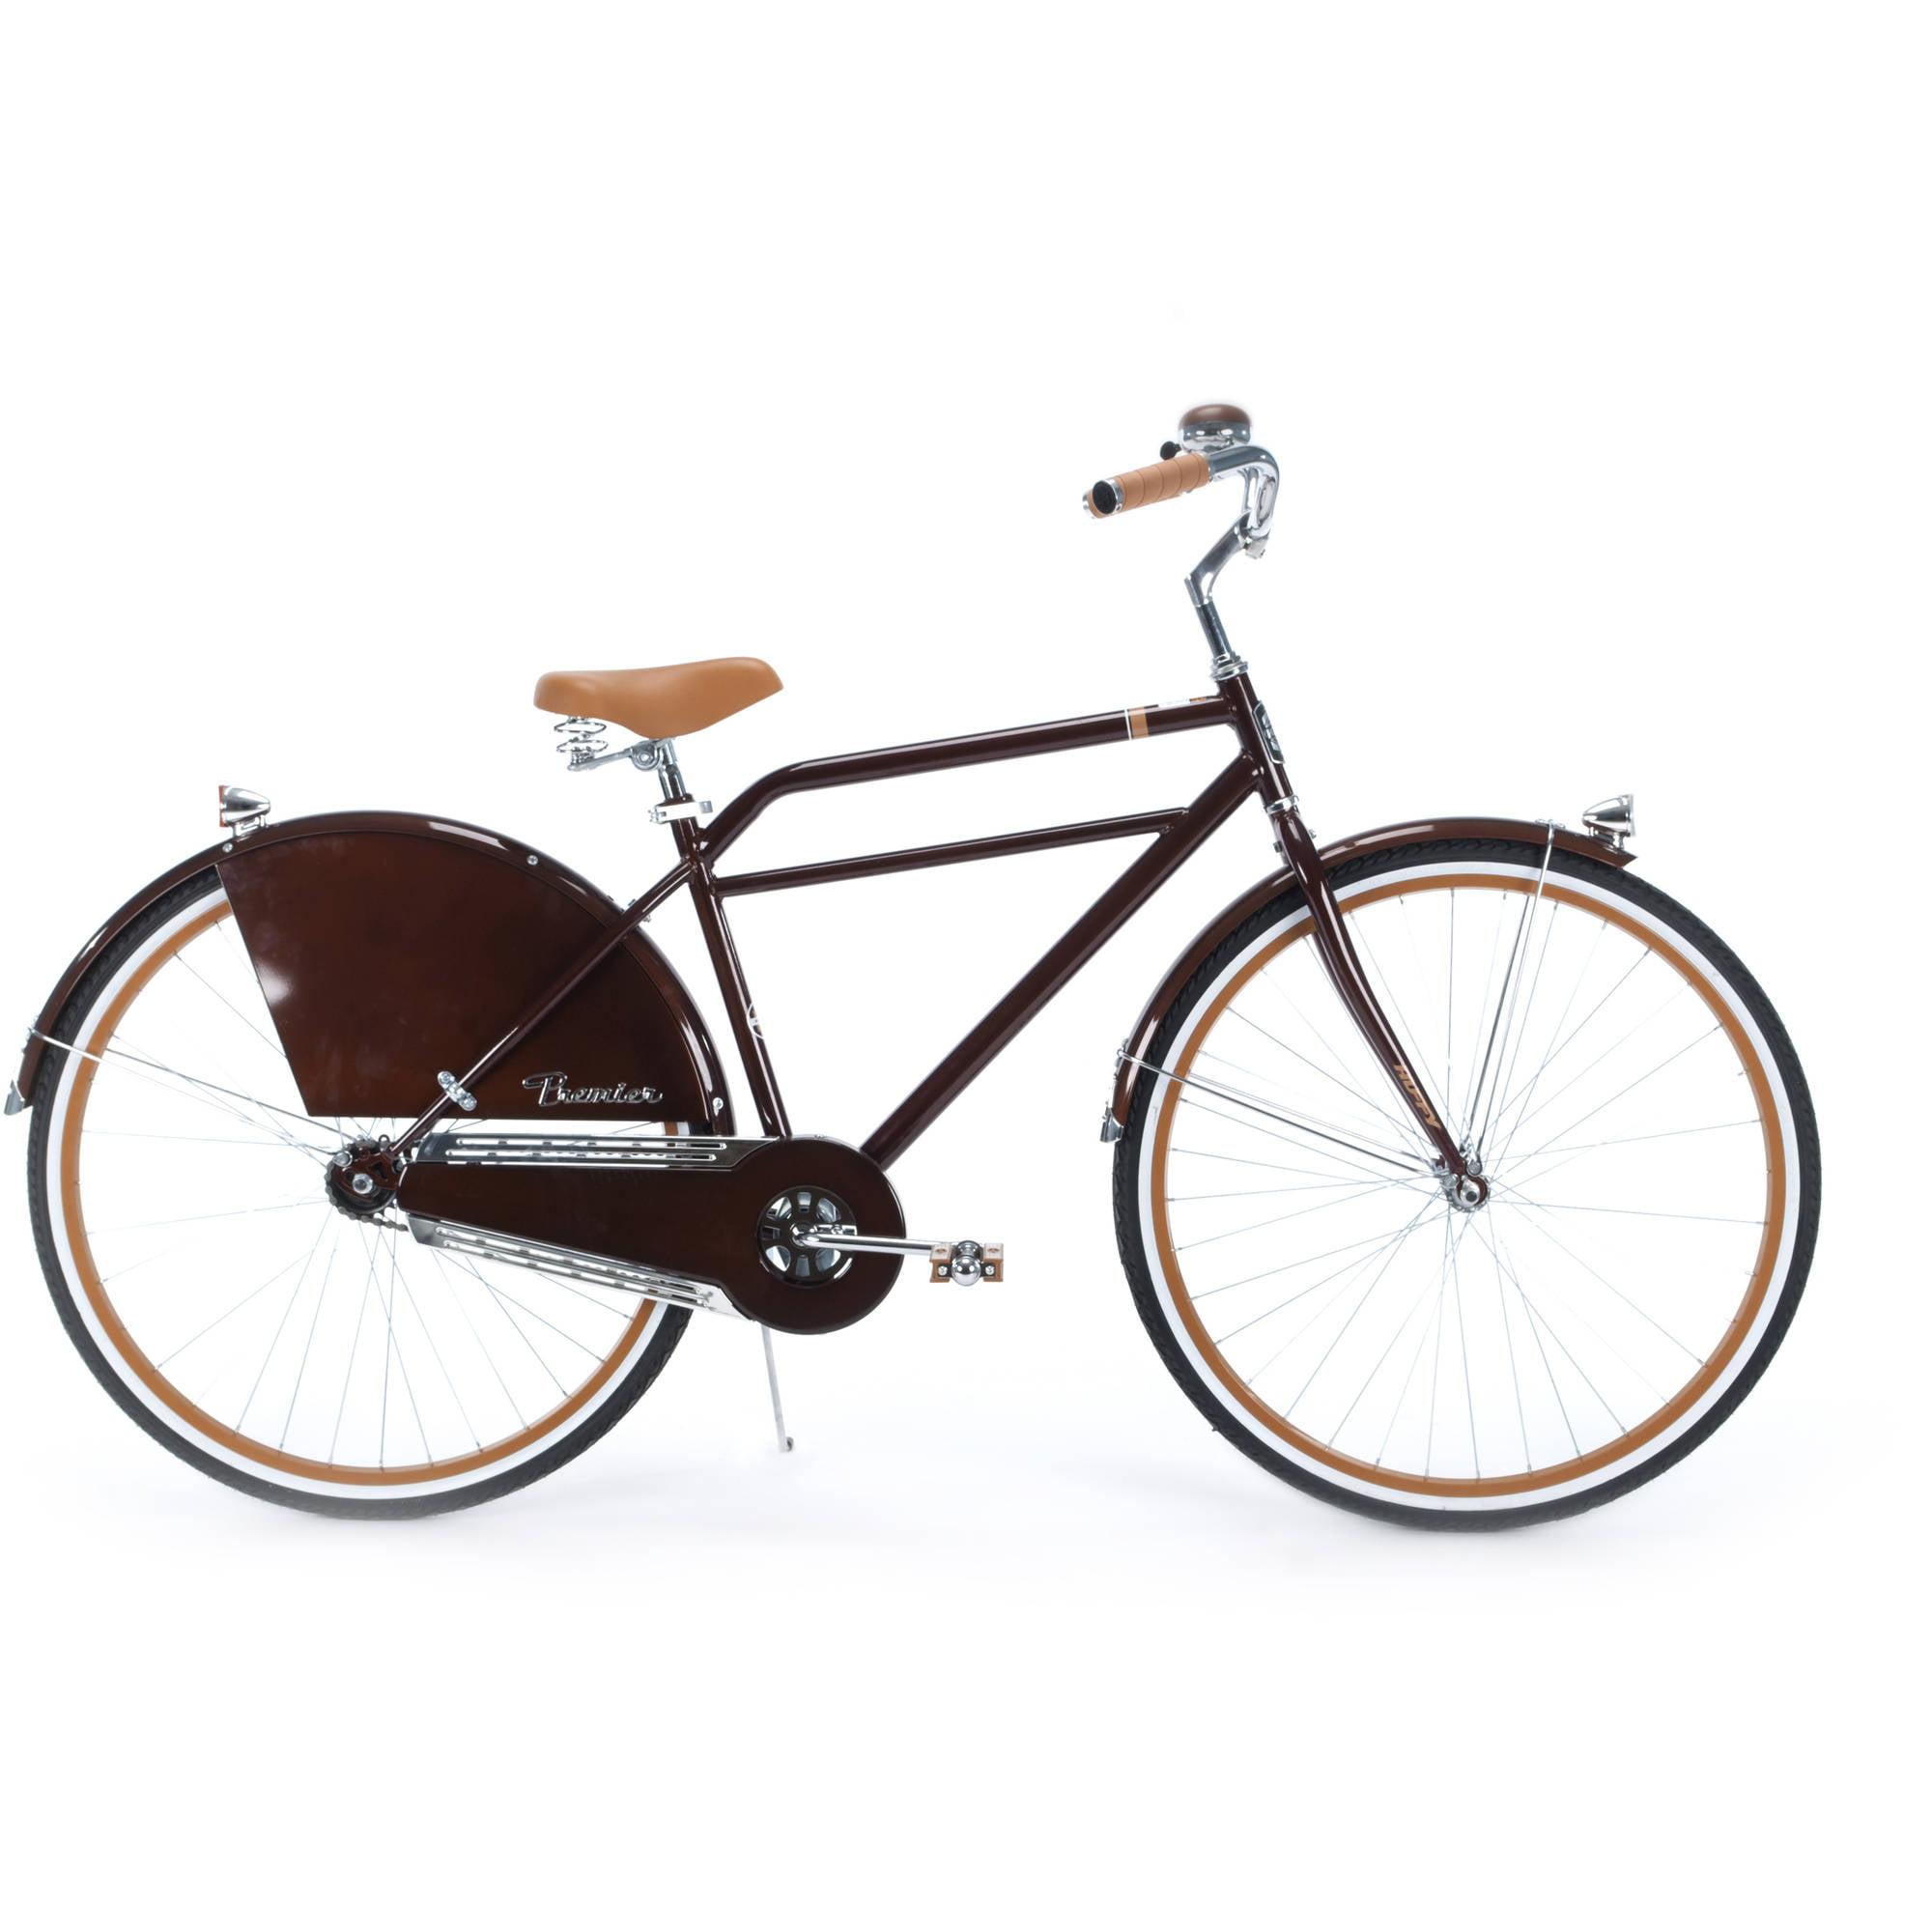 700c Huffy Premier Men S Cruiser Bike Root Beer Walmart Inventory Checker Brickseek